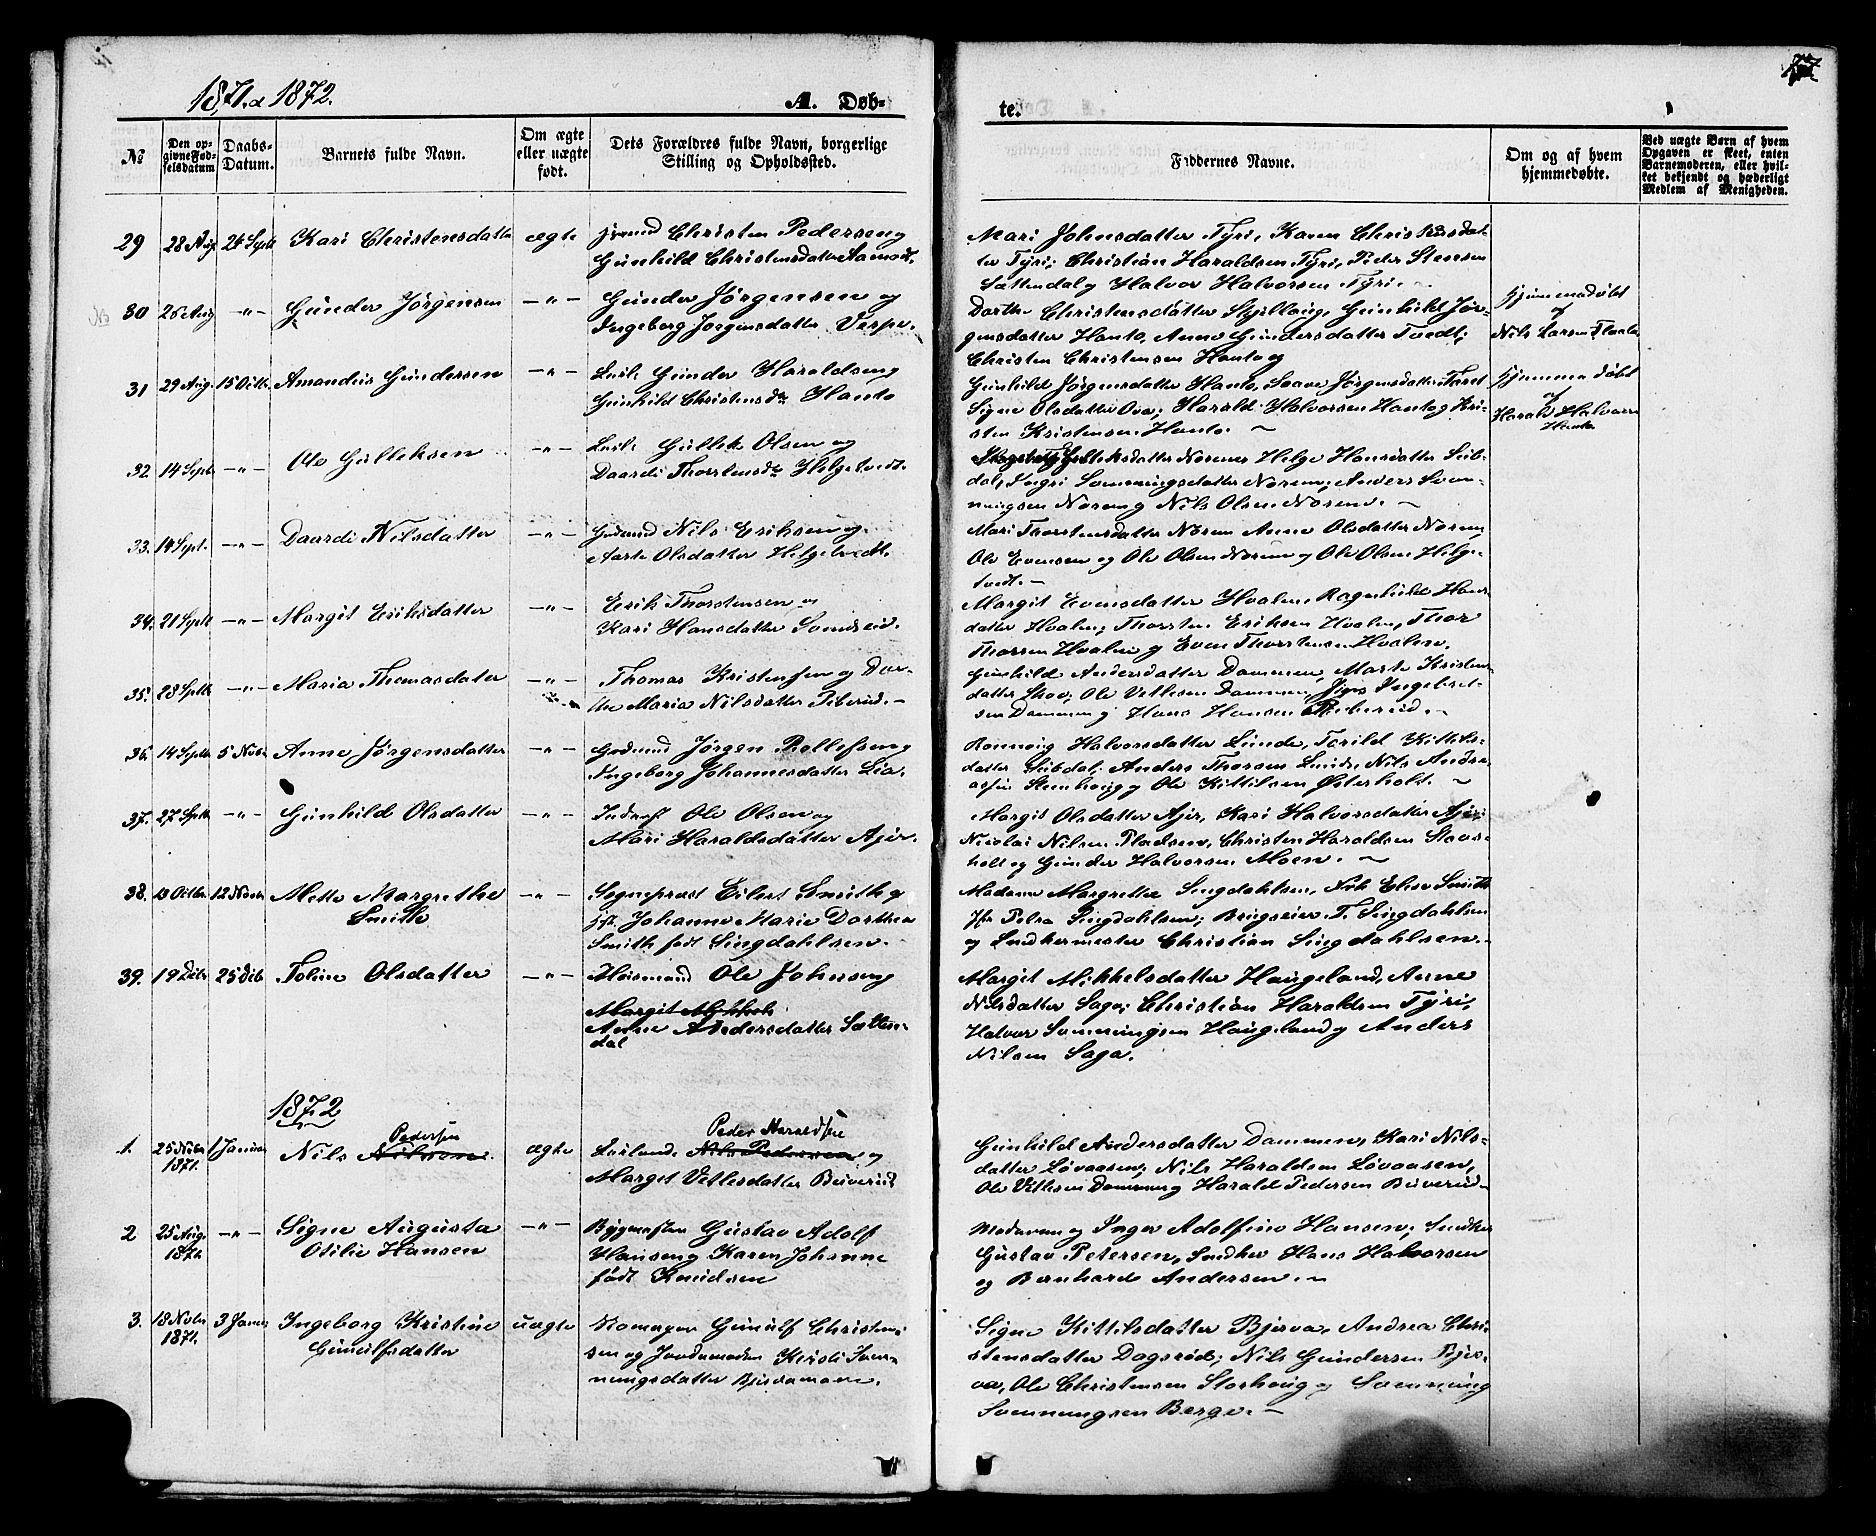 SAKO, Lunde kirkebøker, F/Fa/L0001: Ministerialbok nr. I 1, 1866-1883, s. 17